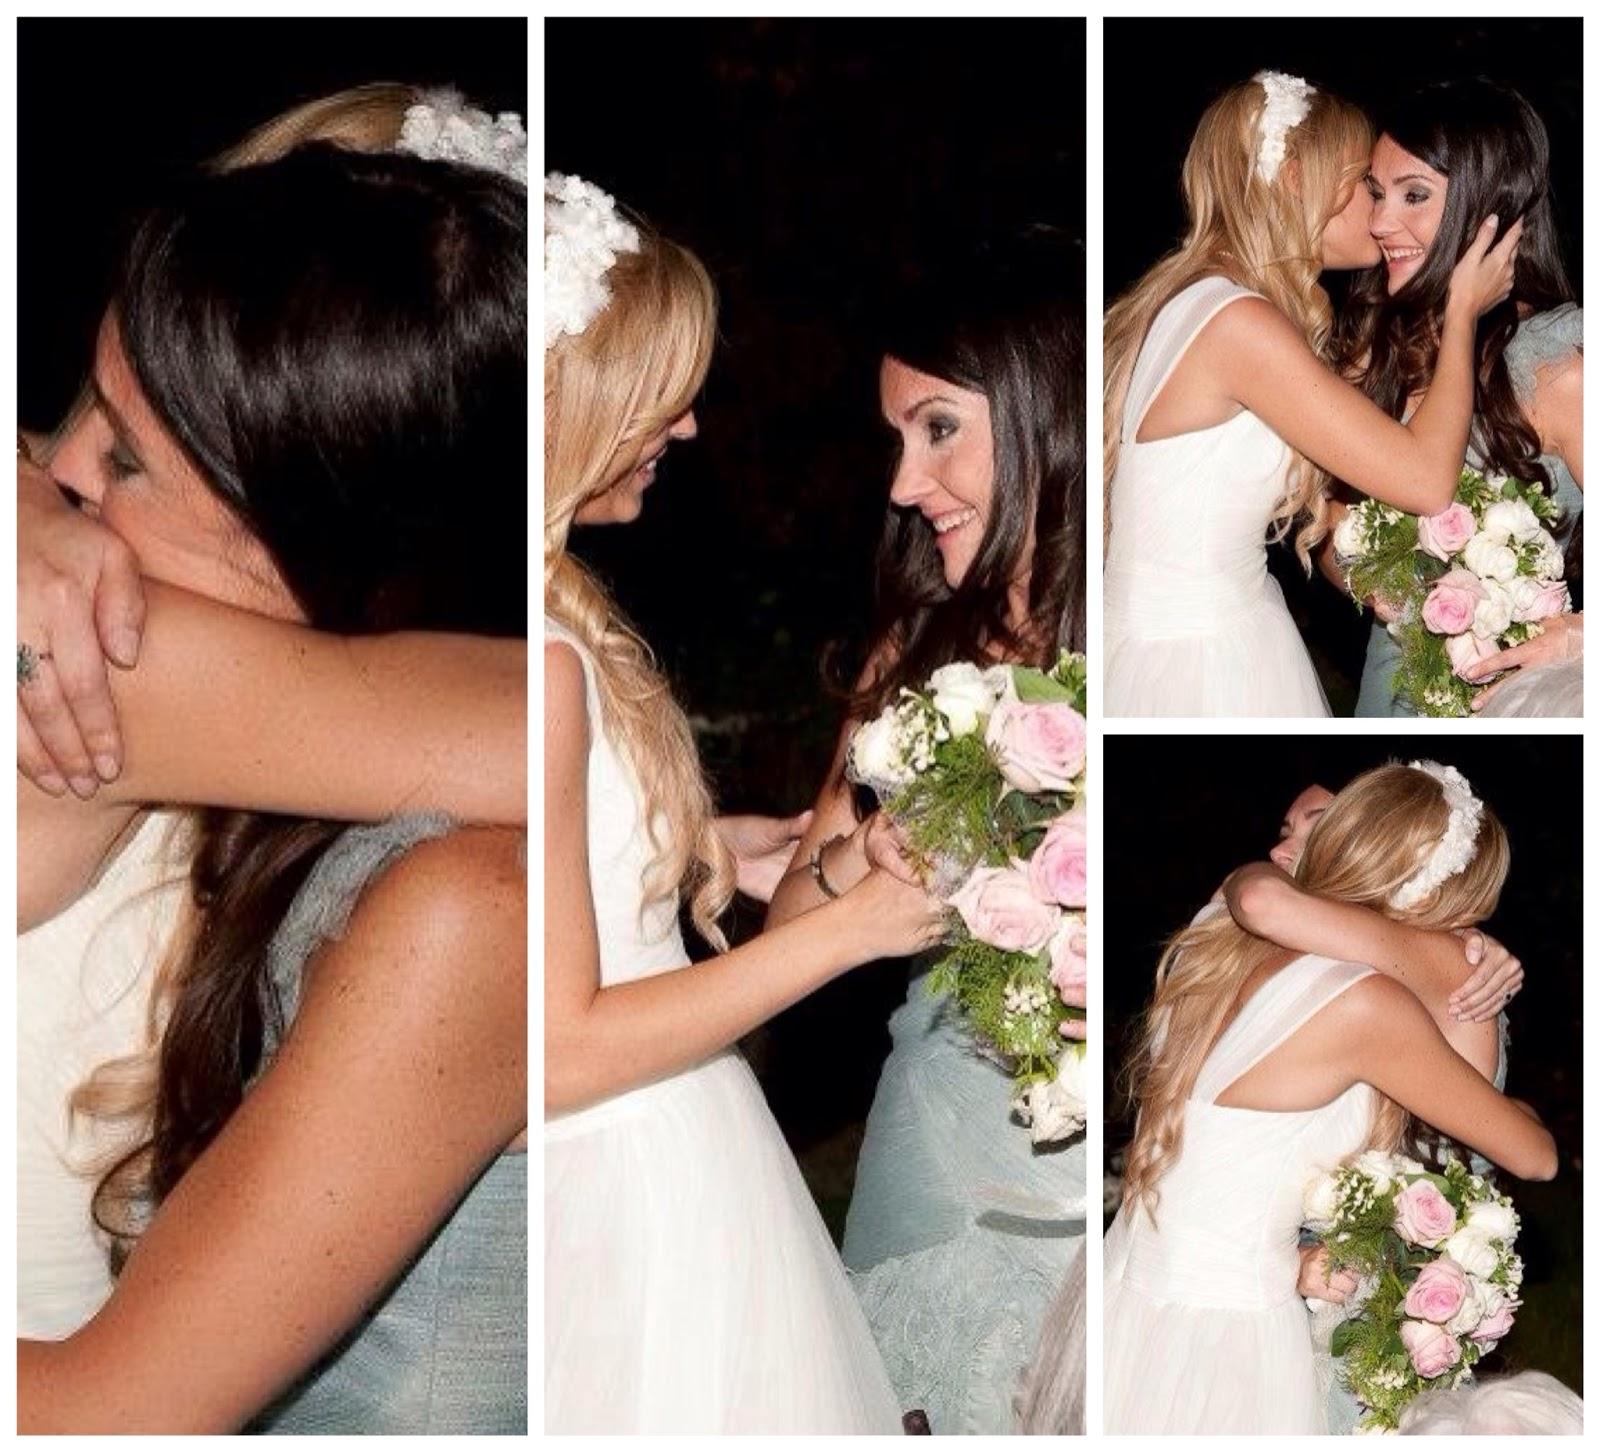 1000 detalles para mi boda c mo o a qui n regalo mi ramo for Regalos para hermanas